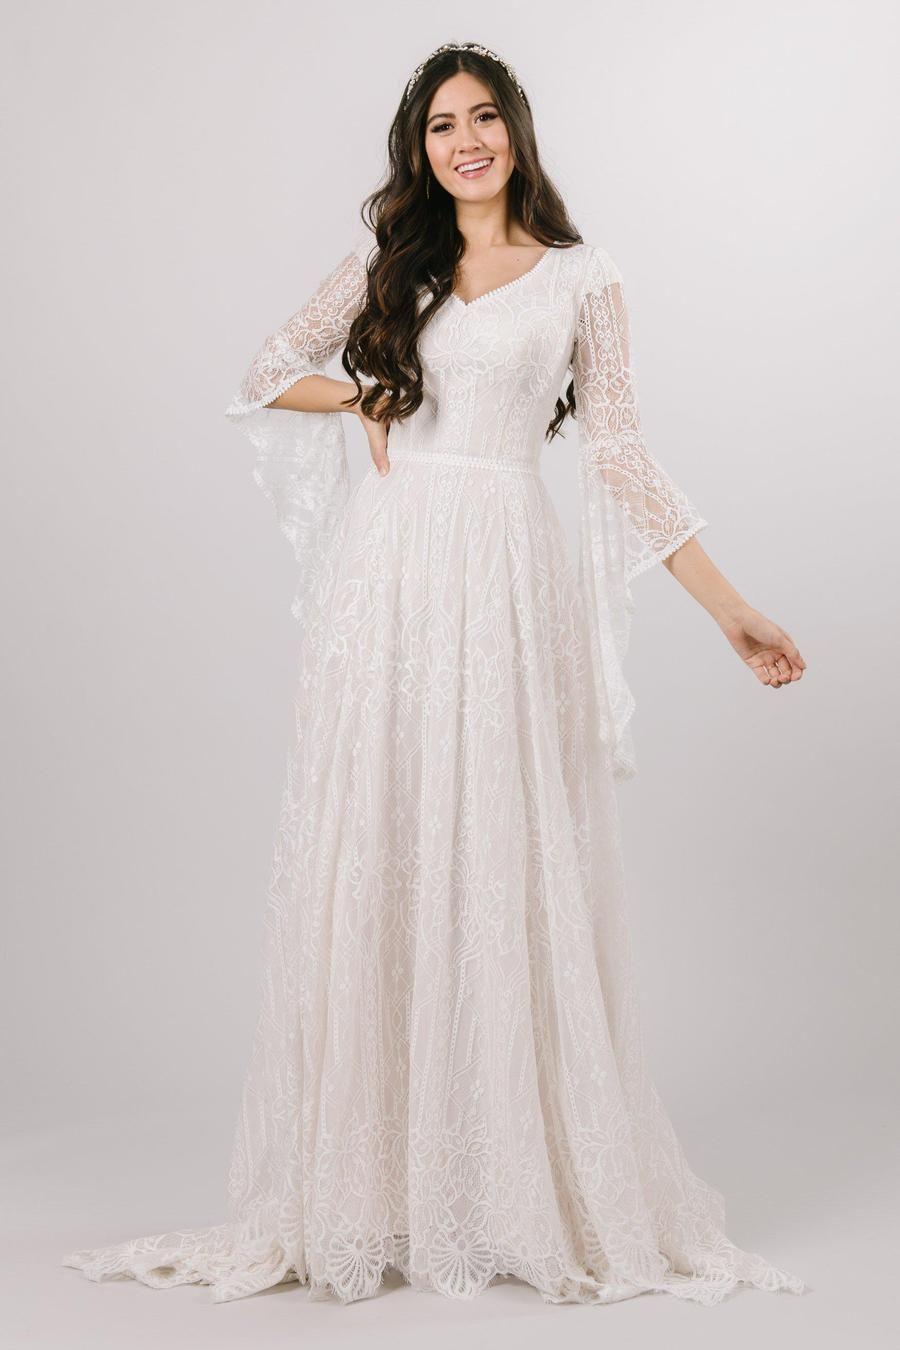 Arwen Modest Wedding Dresses Wedding Dress Shopping Wedding Dresses [ 1350 x 900 Pixel ]